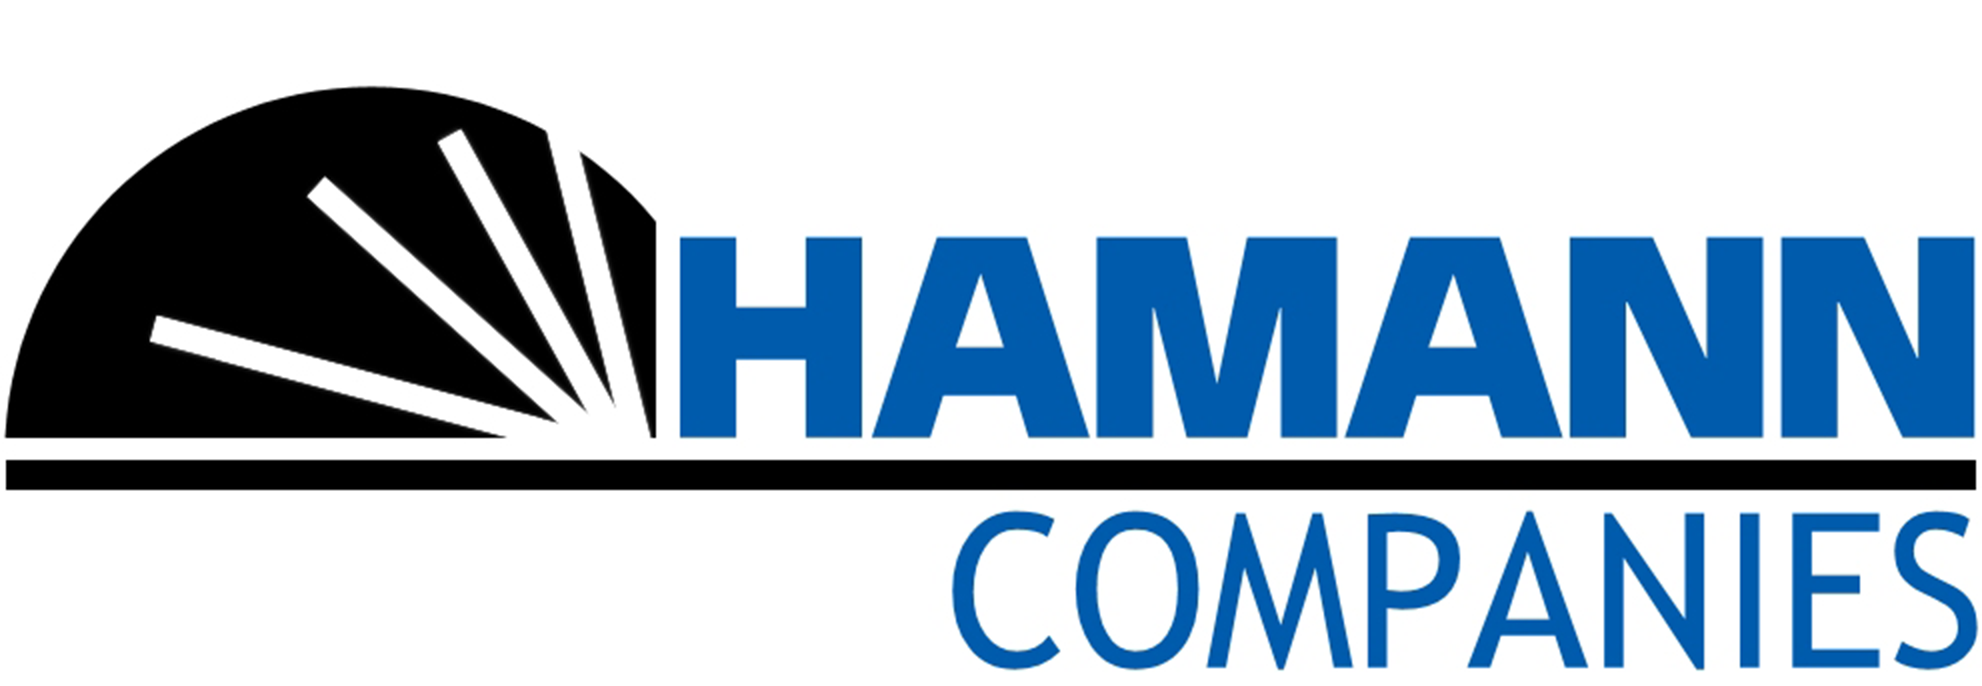 hamann_companies@2x